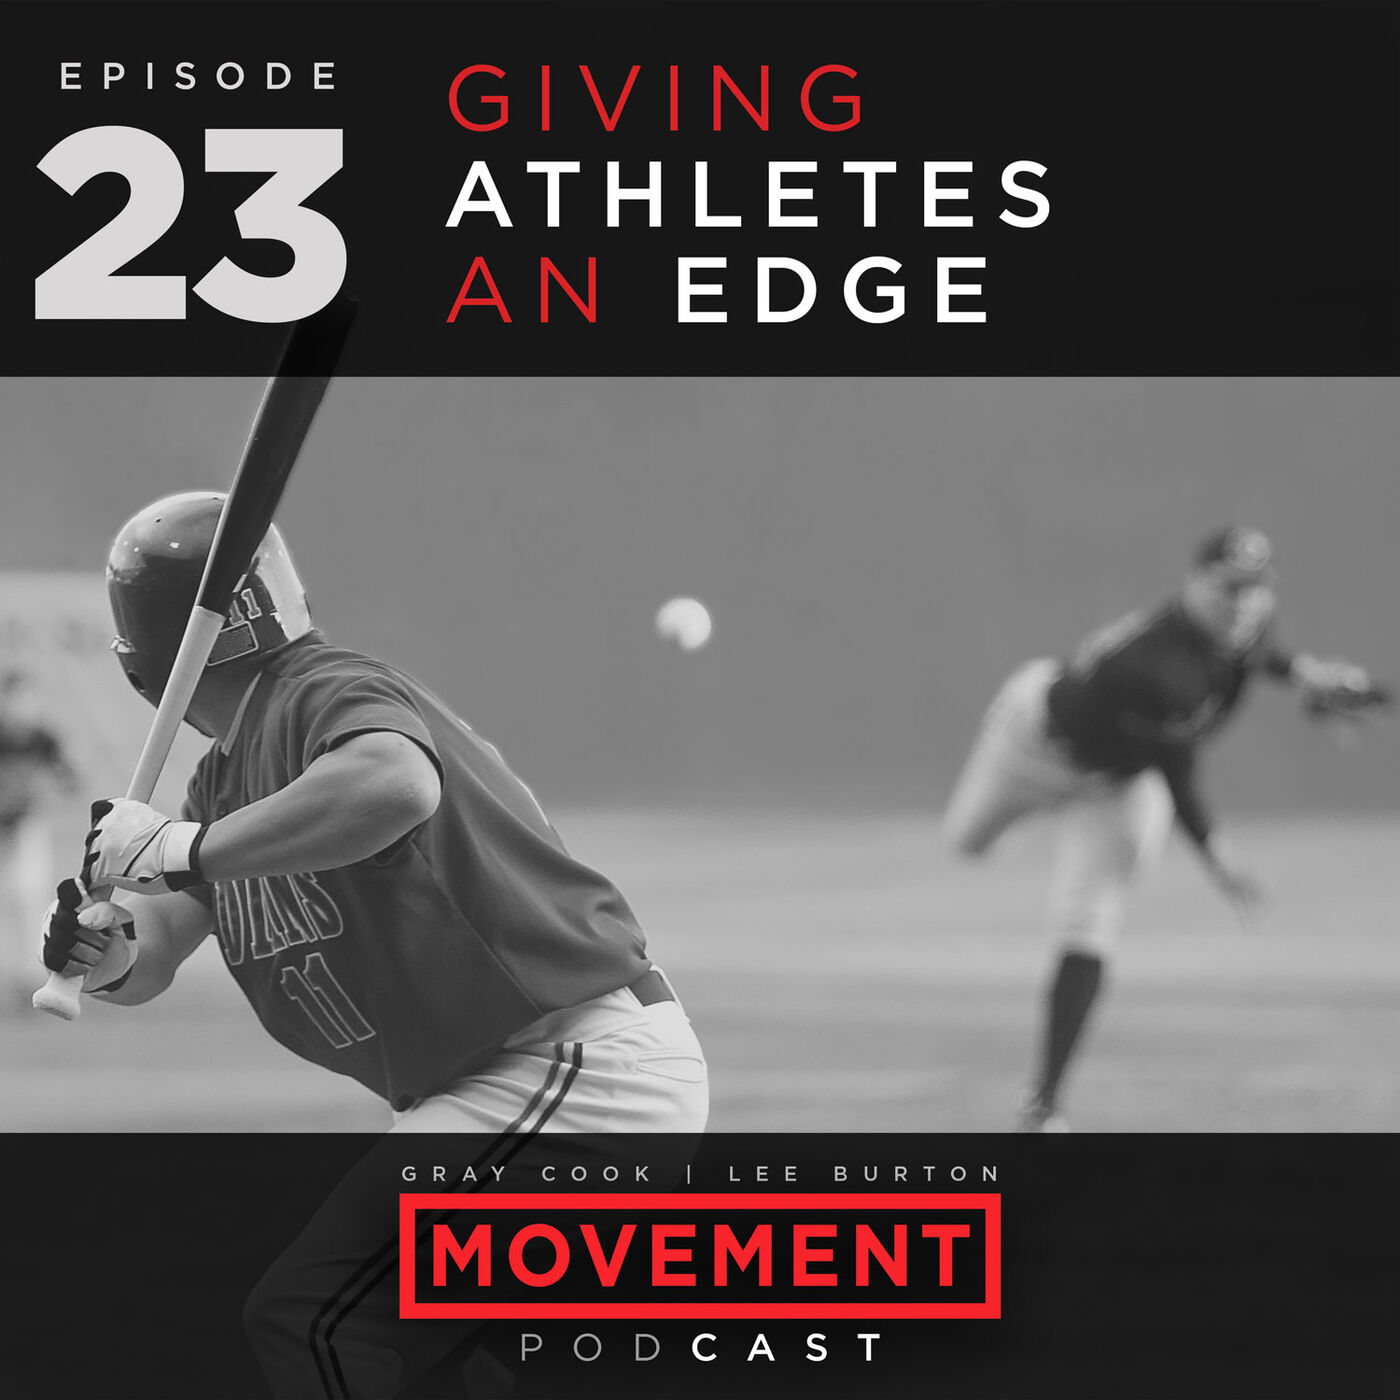 Giving Athletes an Edge